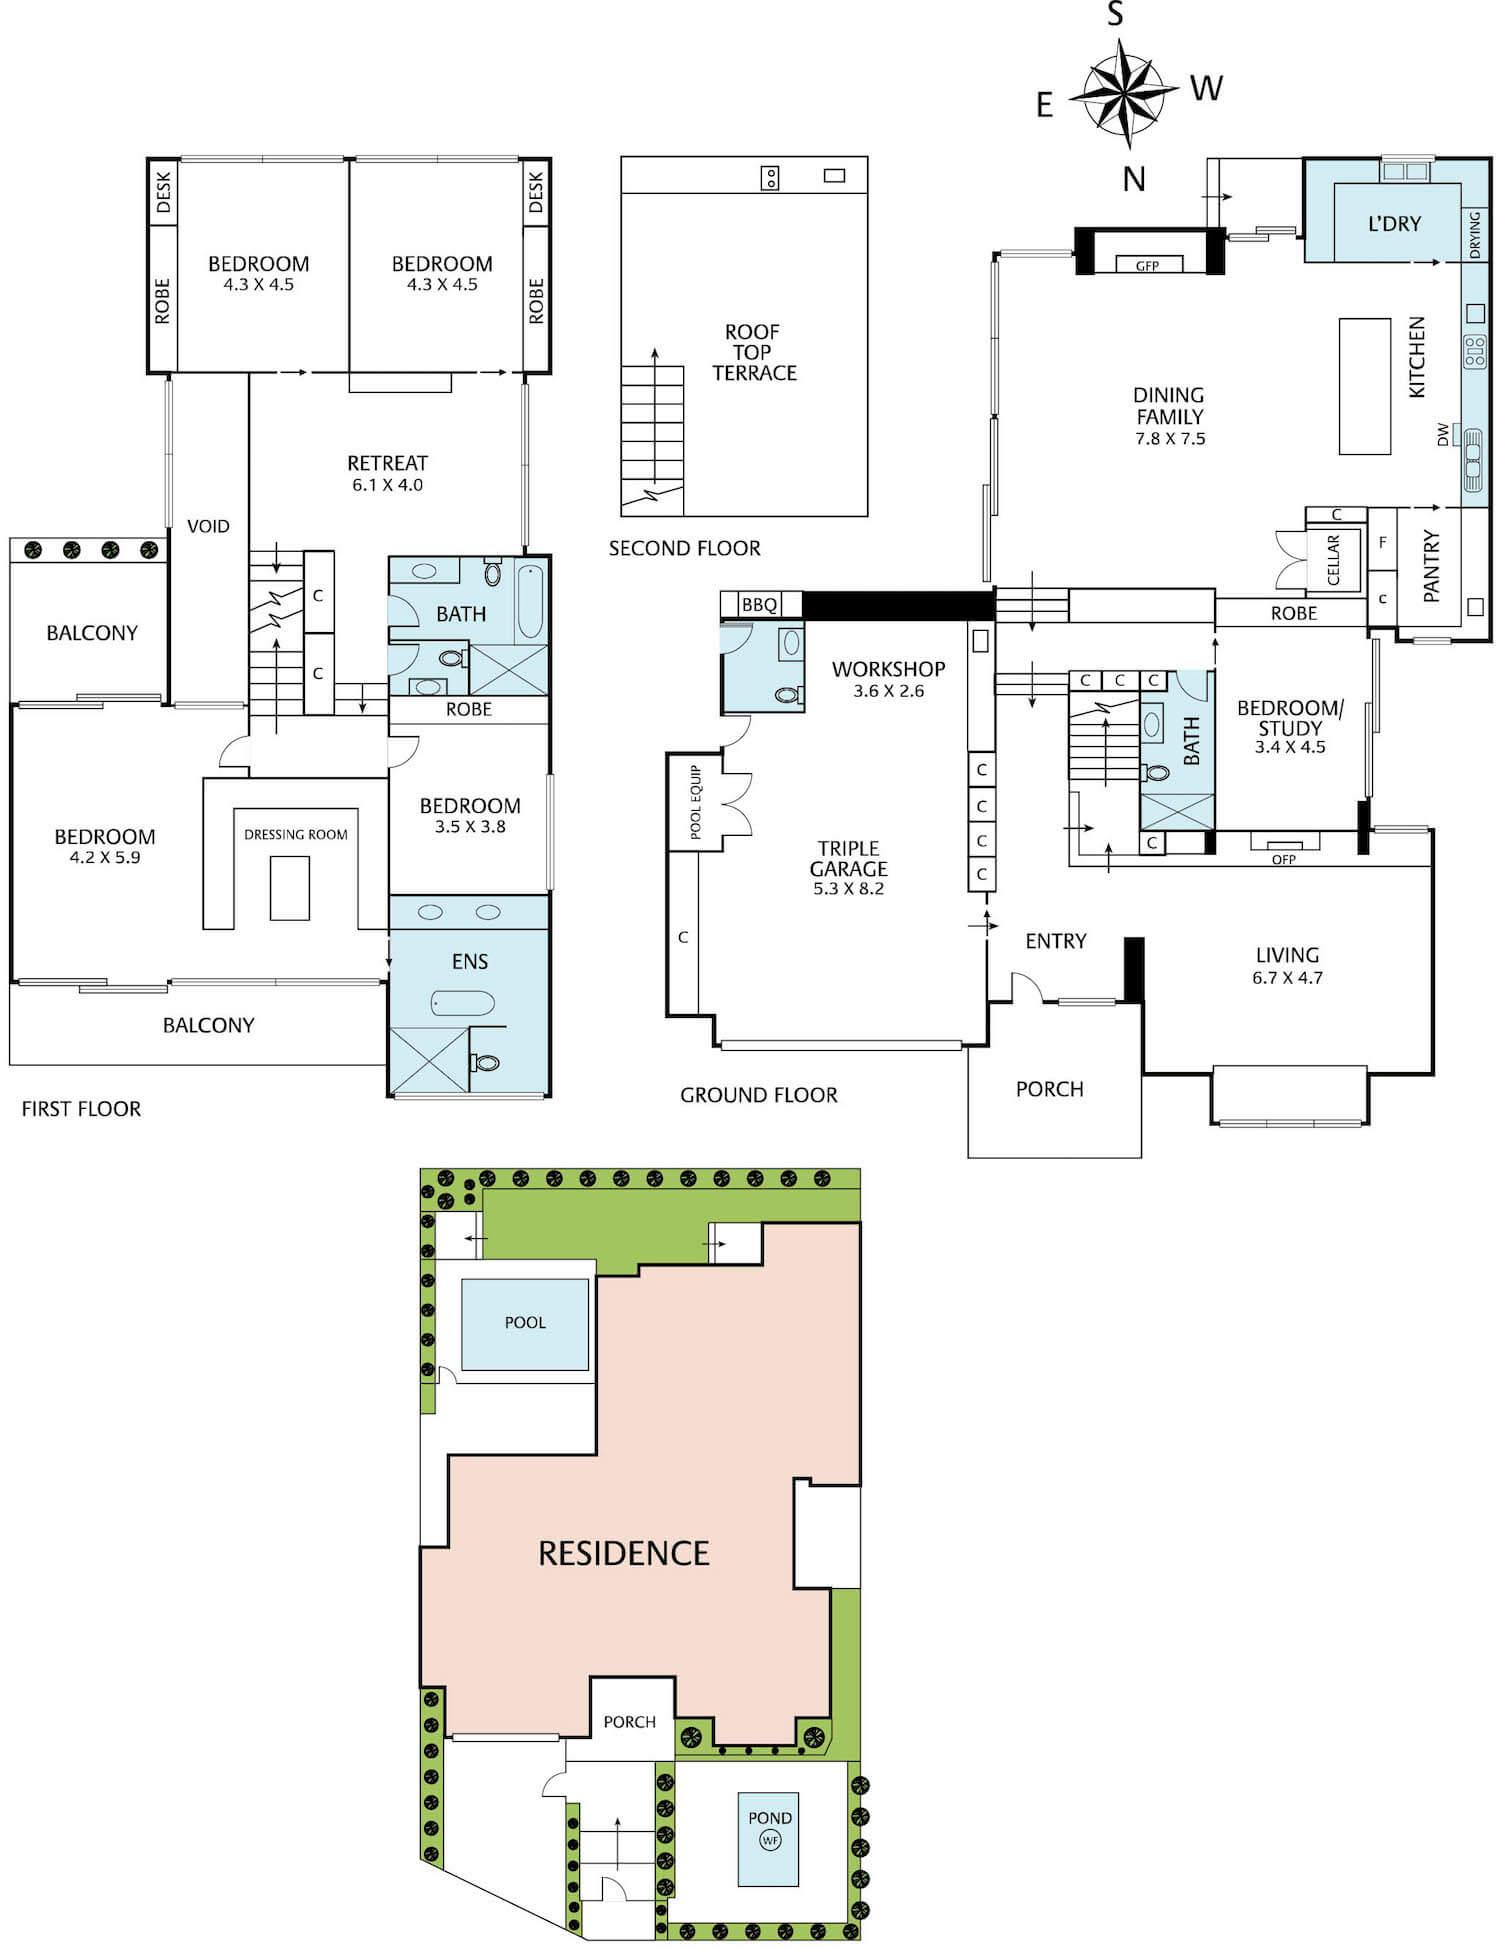 est living open house 14viewstreet hawthorn jellis craig floorplan